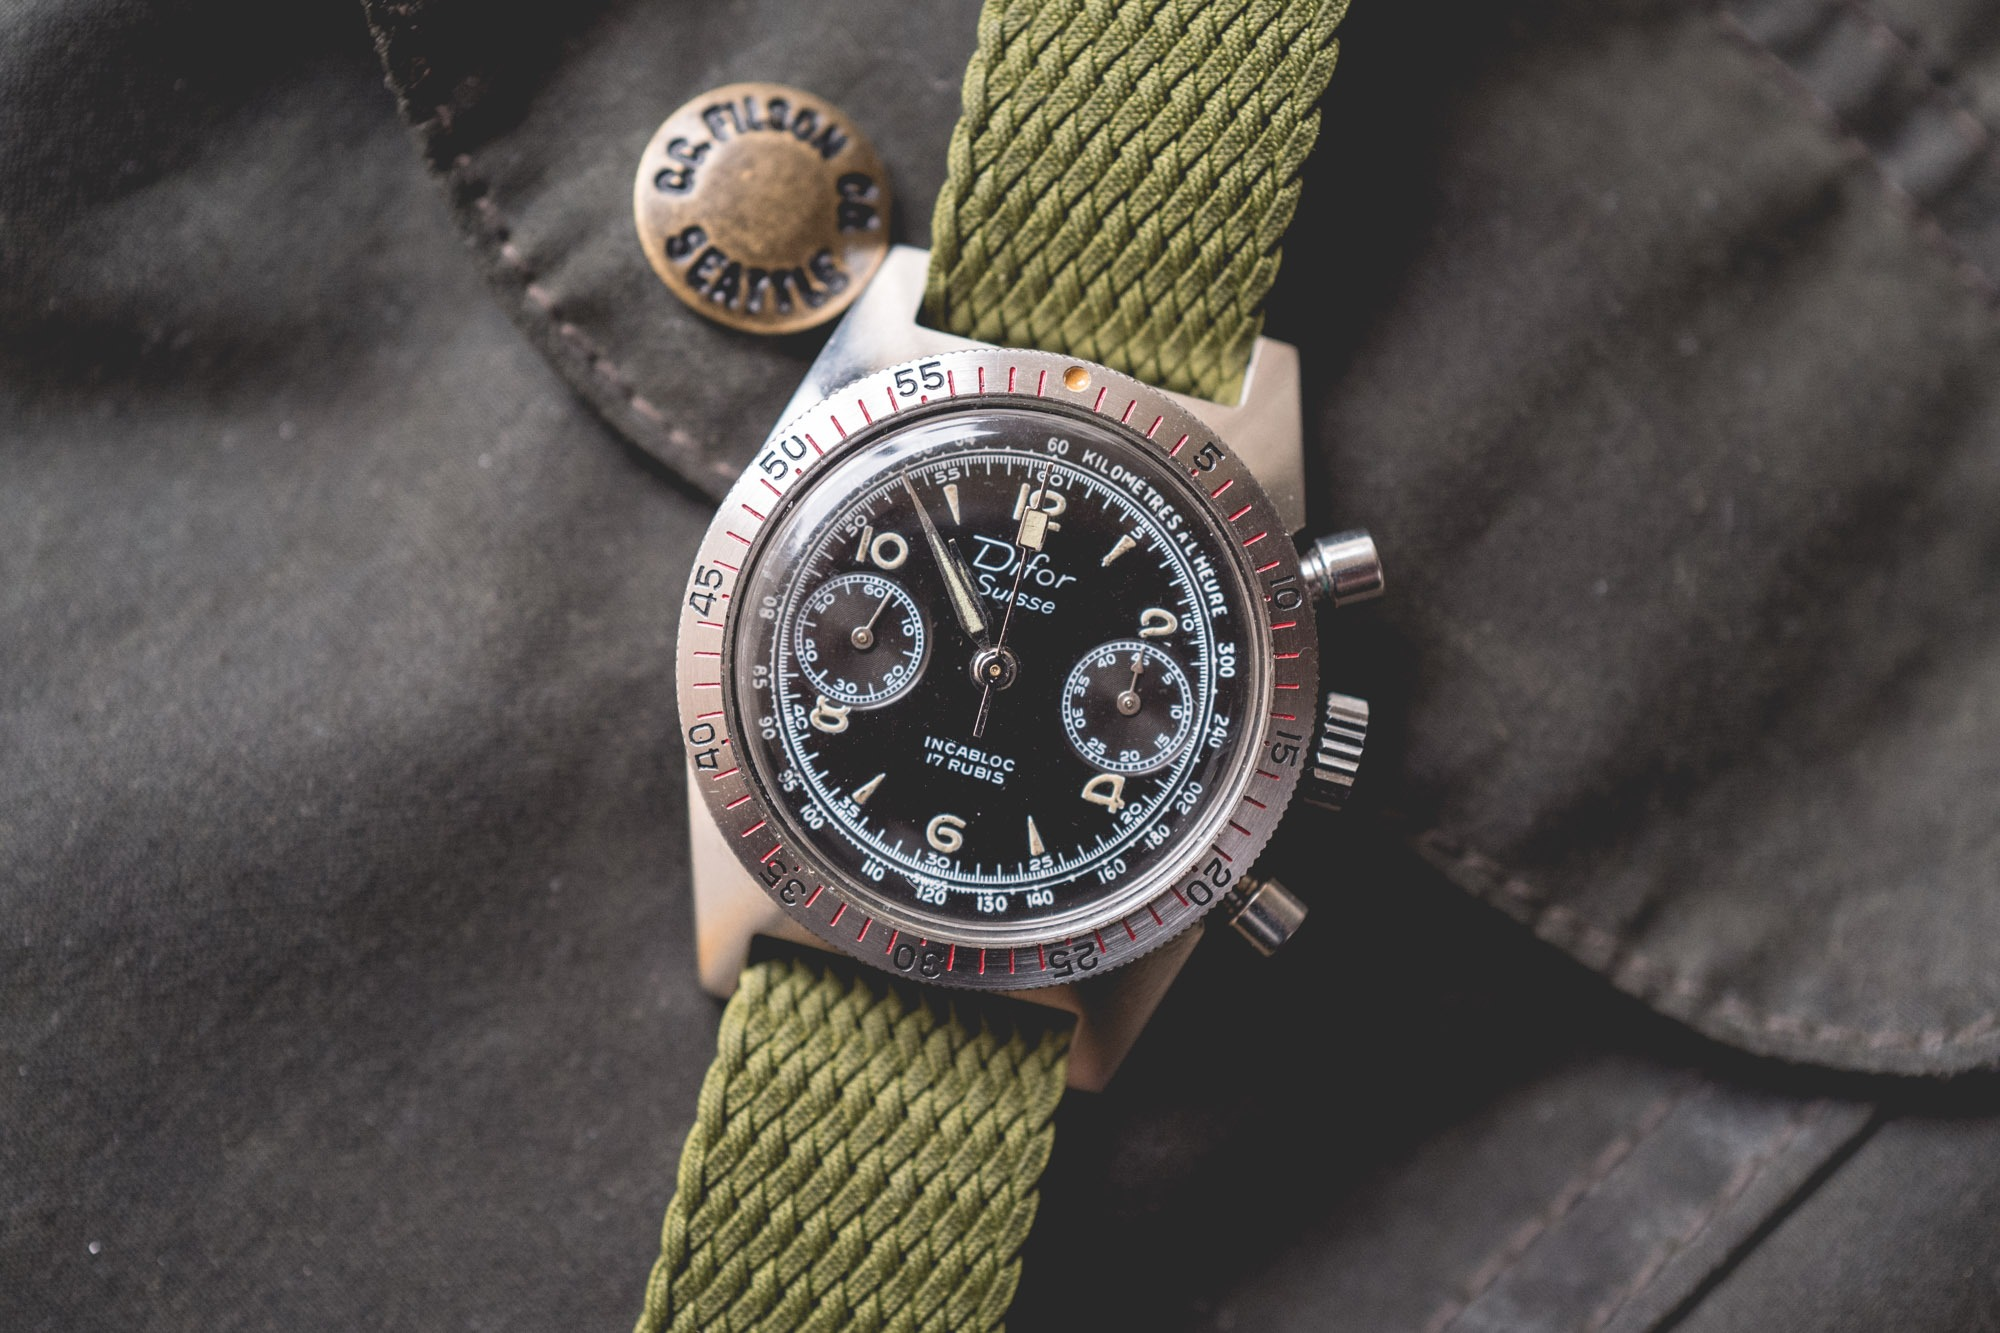 Difor Suisse - Chronographe Circa 1960's